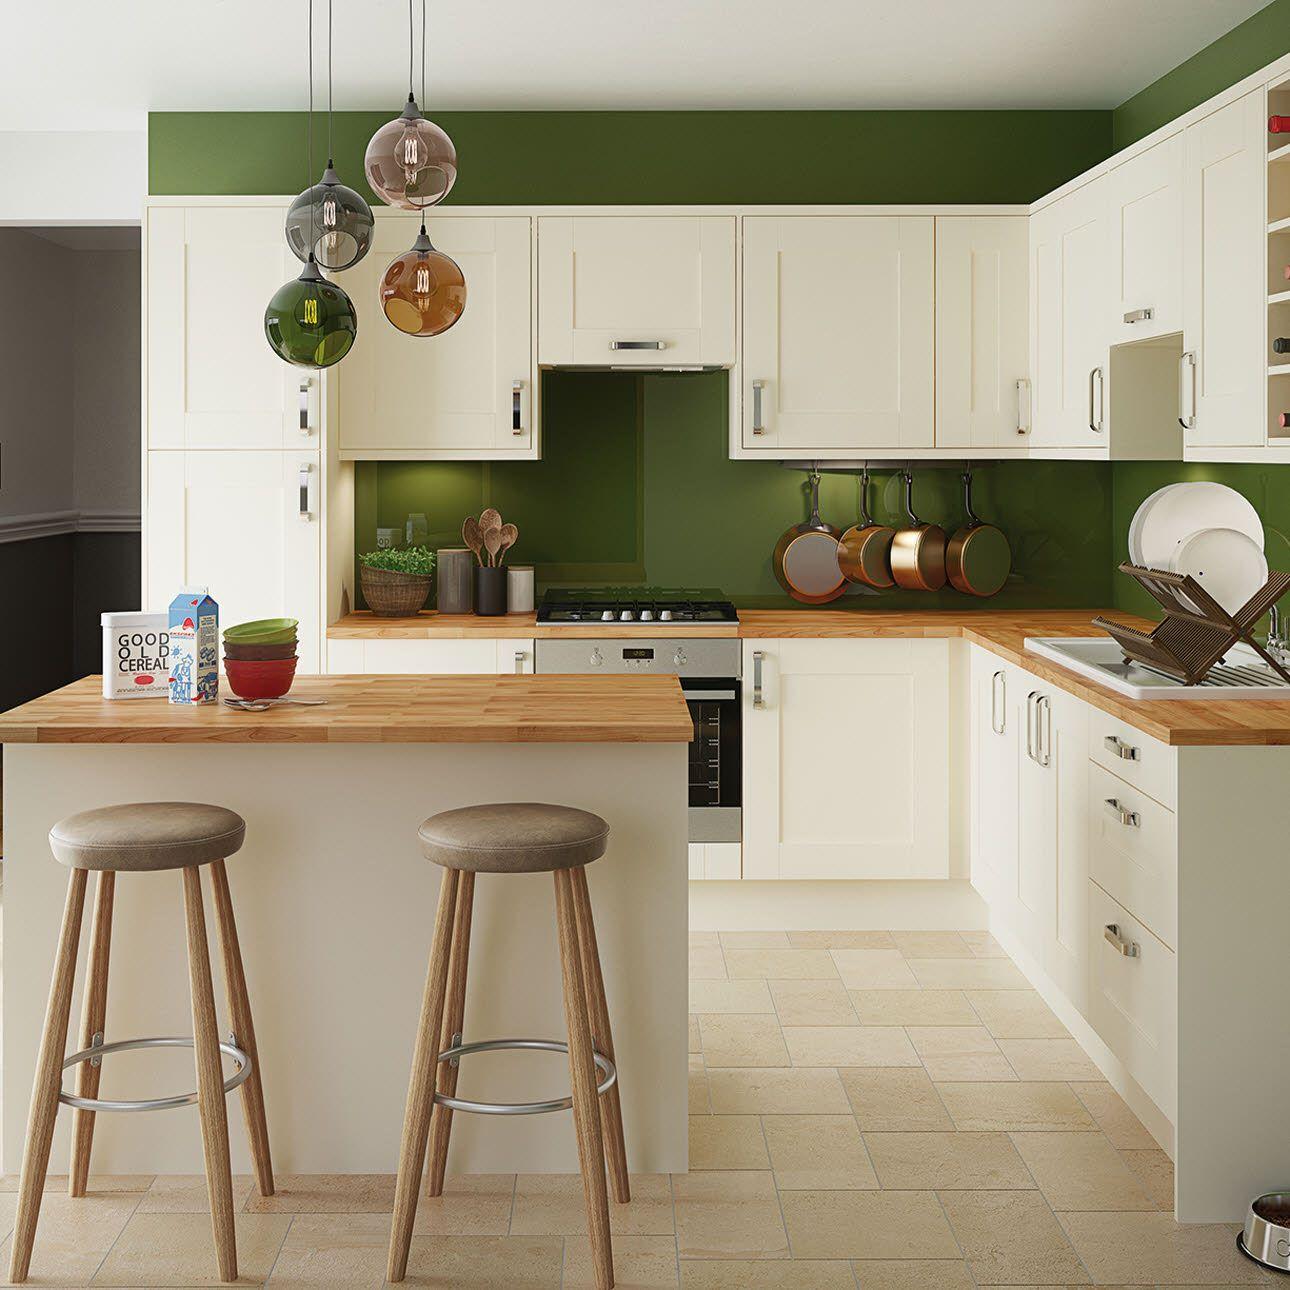 Hudson Cream Green kitchen walls, Kitchen renovation